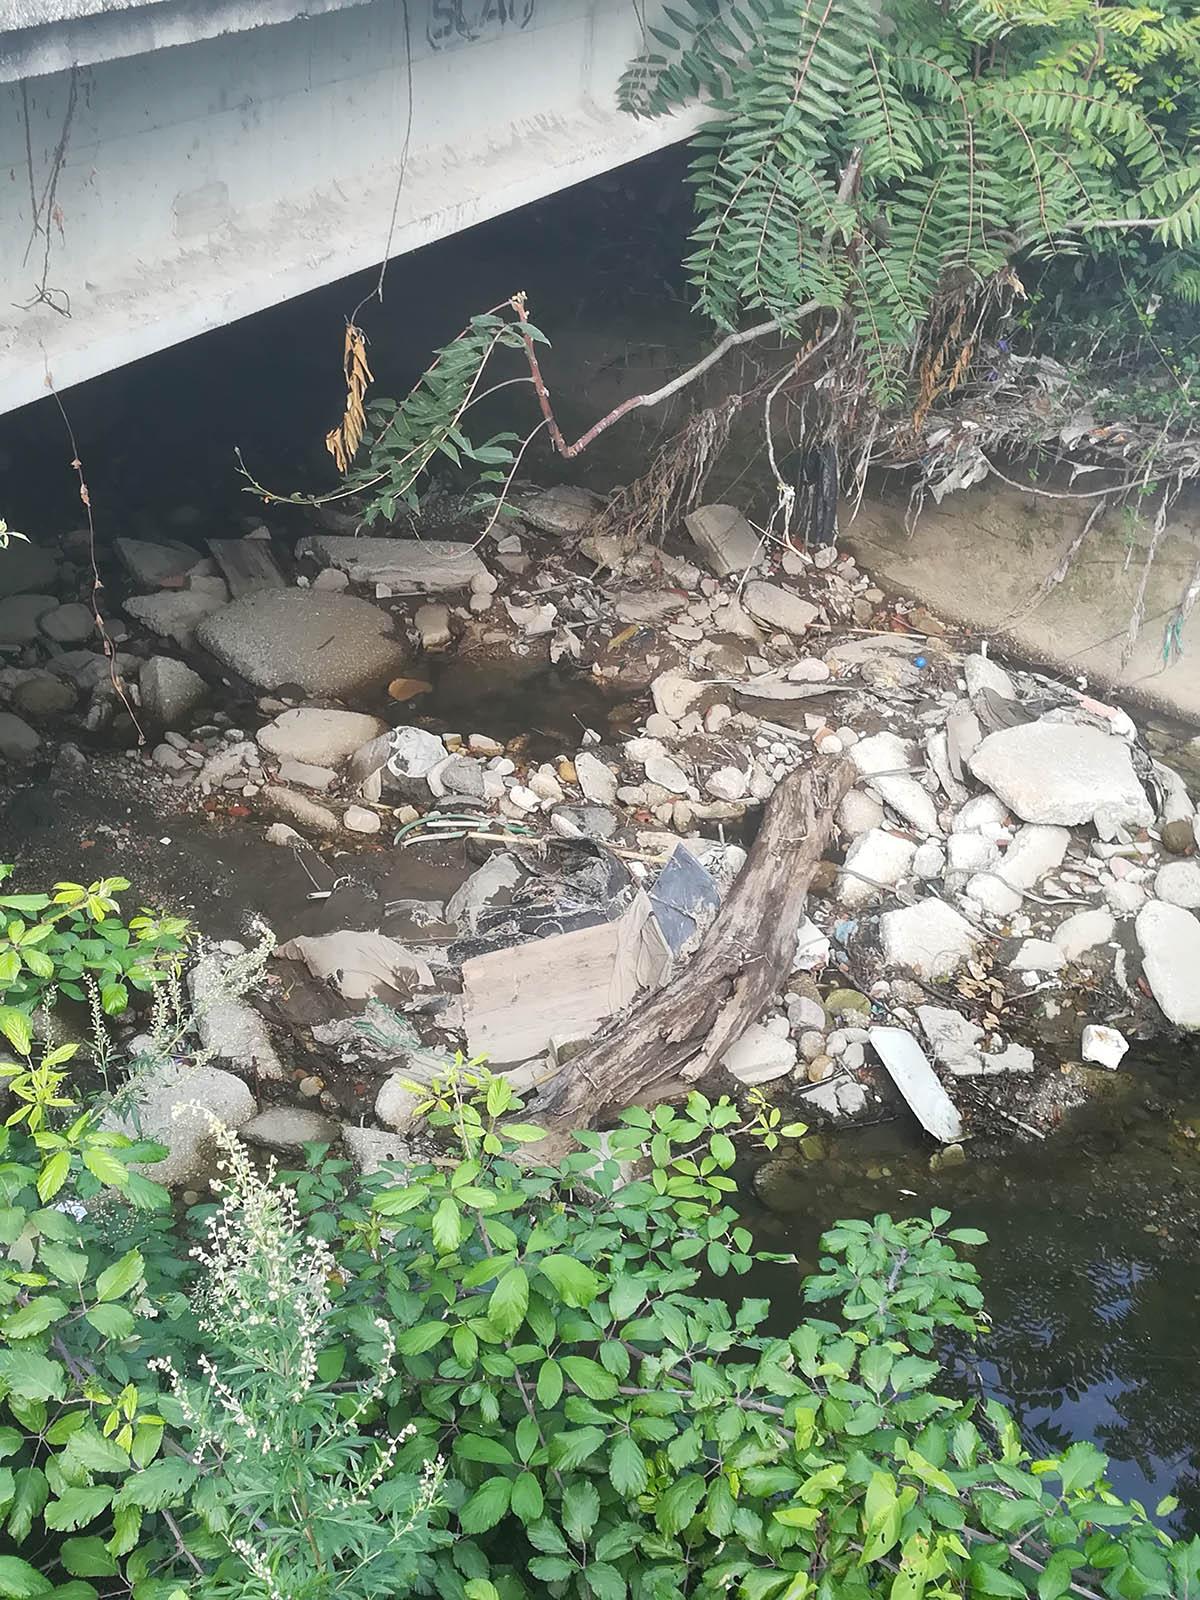 Napoli, zona flegrea:  L'Alveo dei Camaldoli, un disastro ambientale